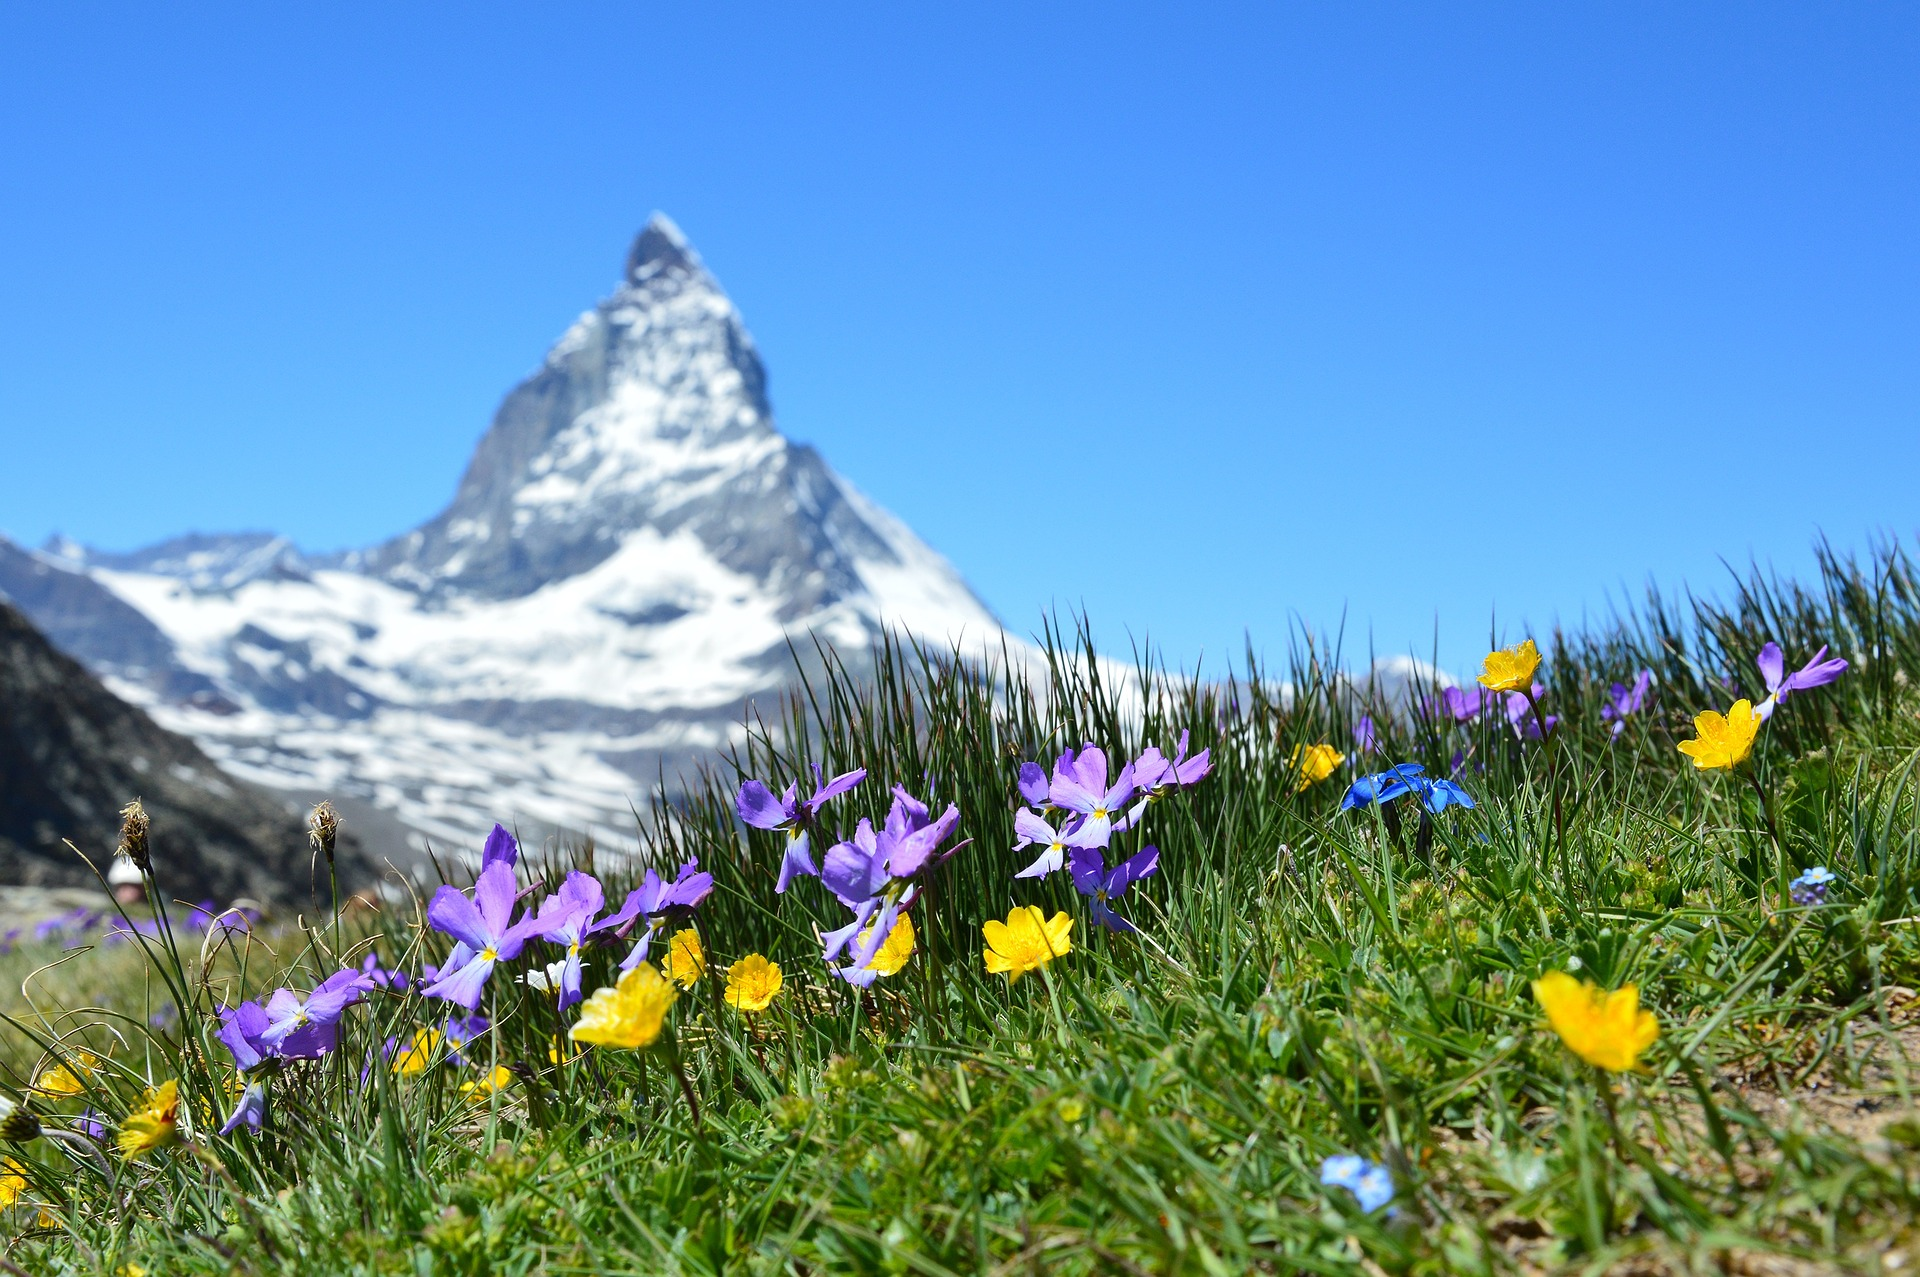 Ingolf Derkow und das Bergwandern Alpen Matterhorn-1516734_1920